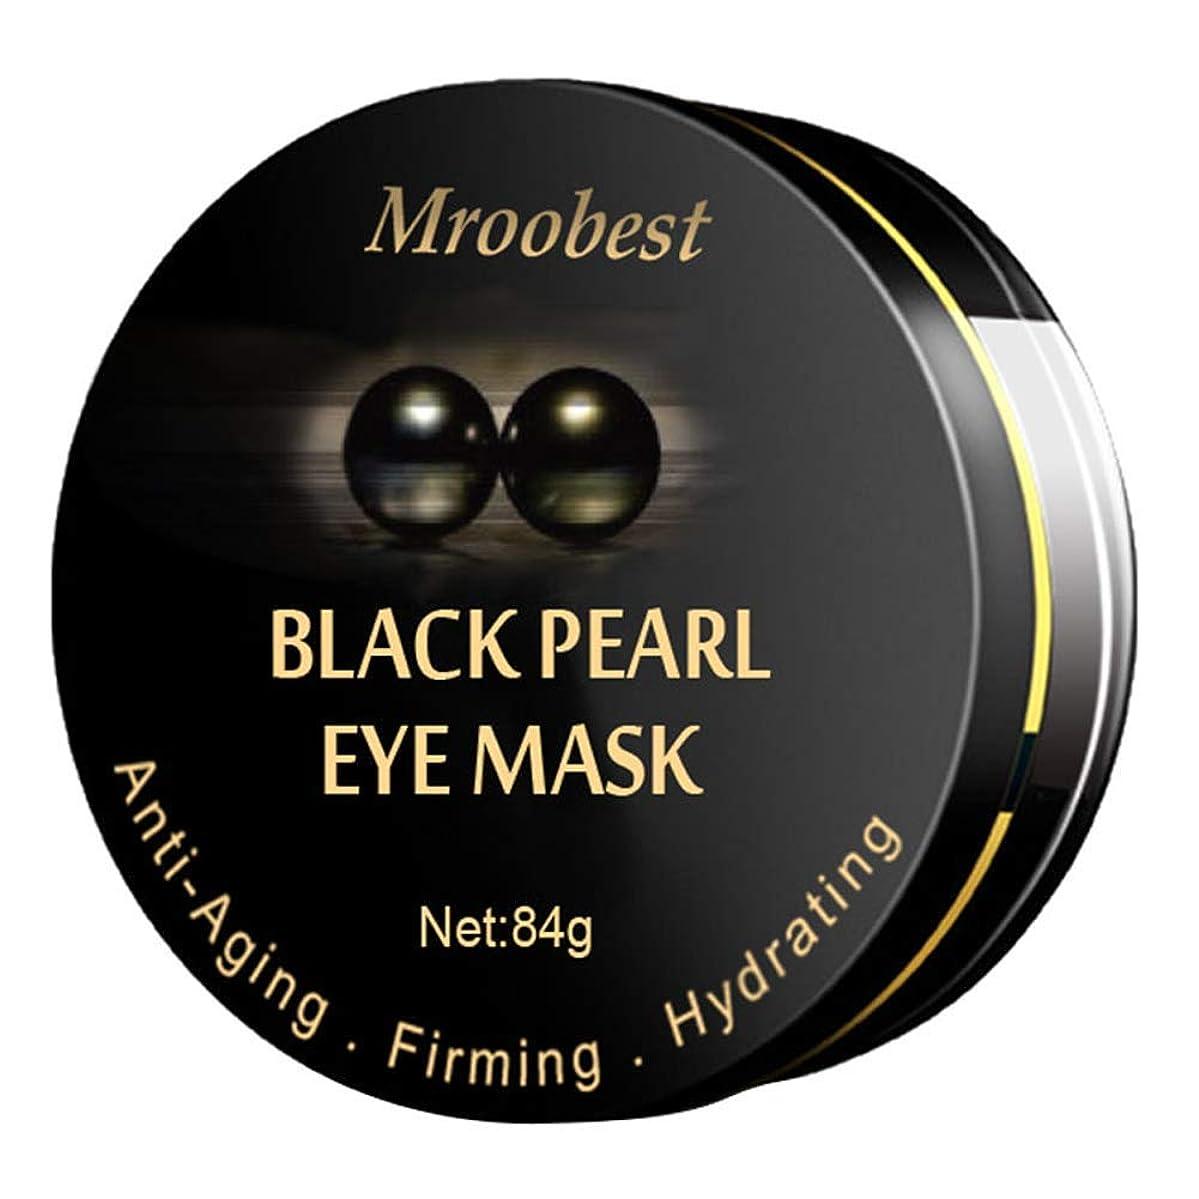 Under Eye Mask, Collagen Eye Mask, Eye Gel Pads, Black Pearl Eye Patch-30 Pairs, Anti-Aging Hyaluronic Acid Eye Patches, Under Eye Pads for Moisturizing & Reducing Dark Circles Puffiness Wrinkles